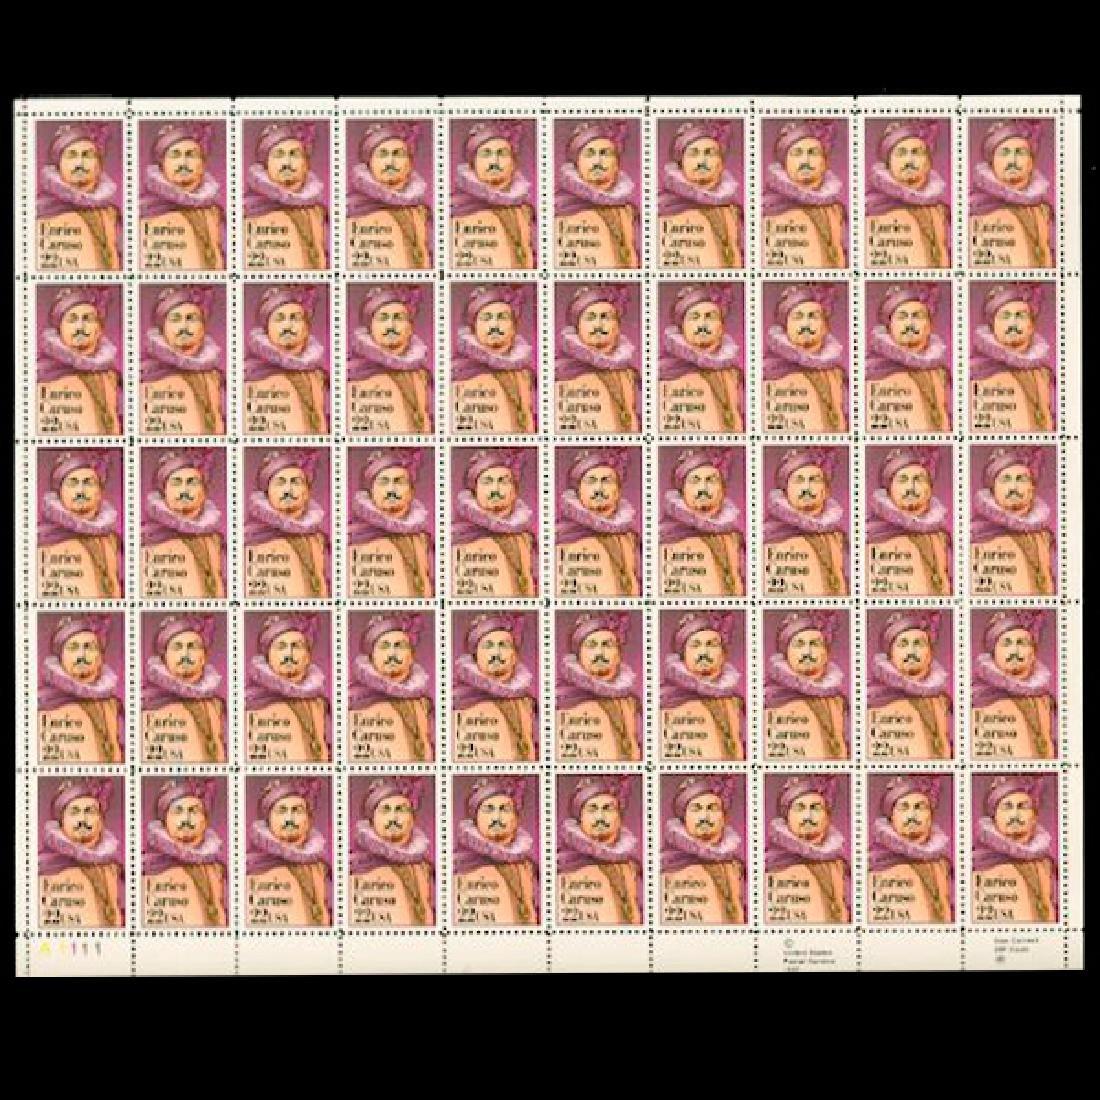 1987 US Sheet 22c Enrico Caruso Stamps MNH Scarce